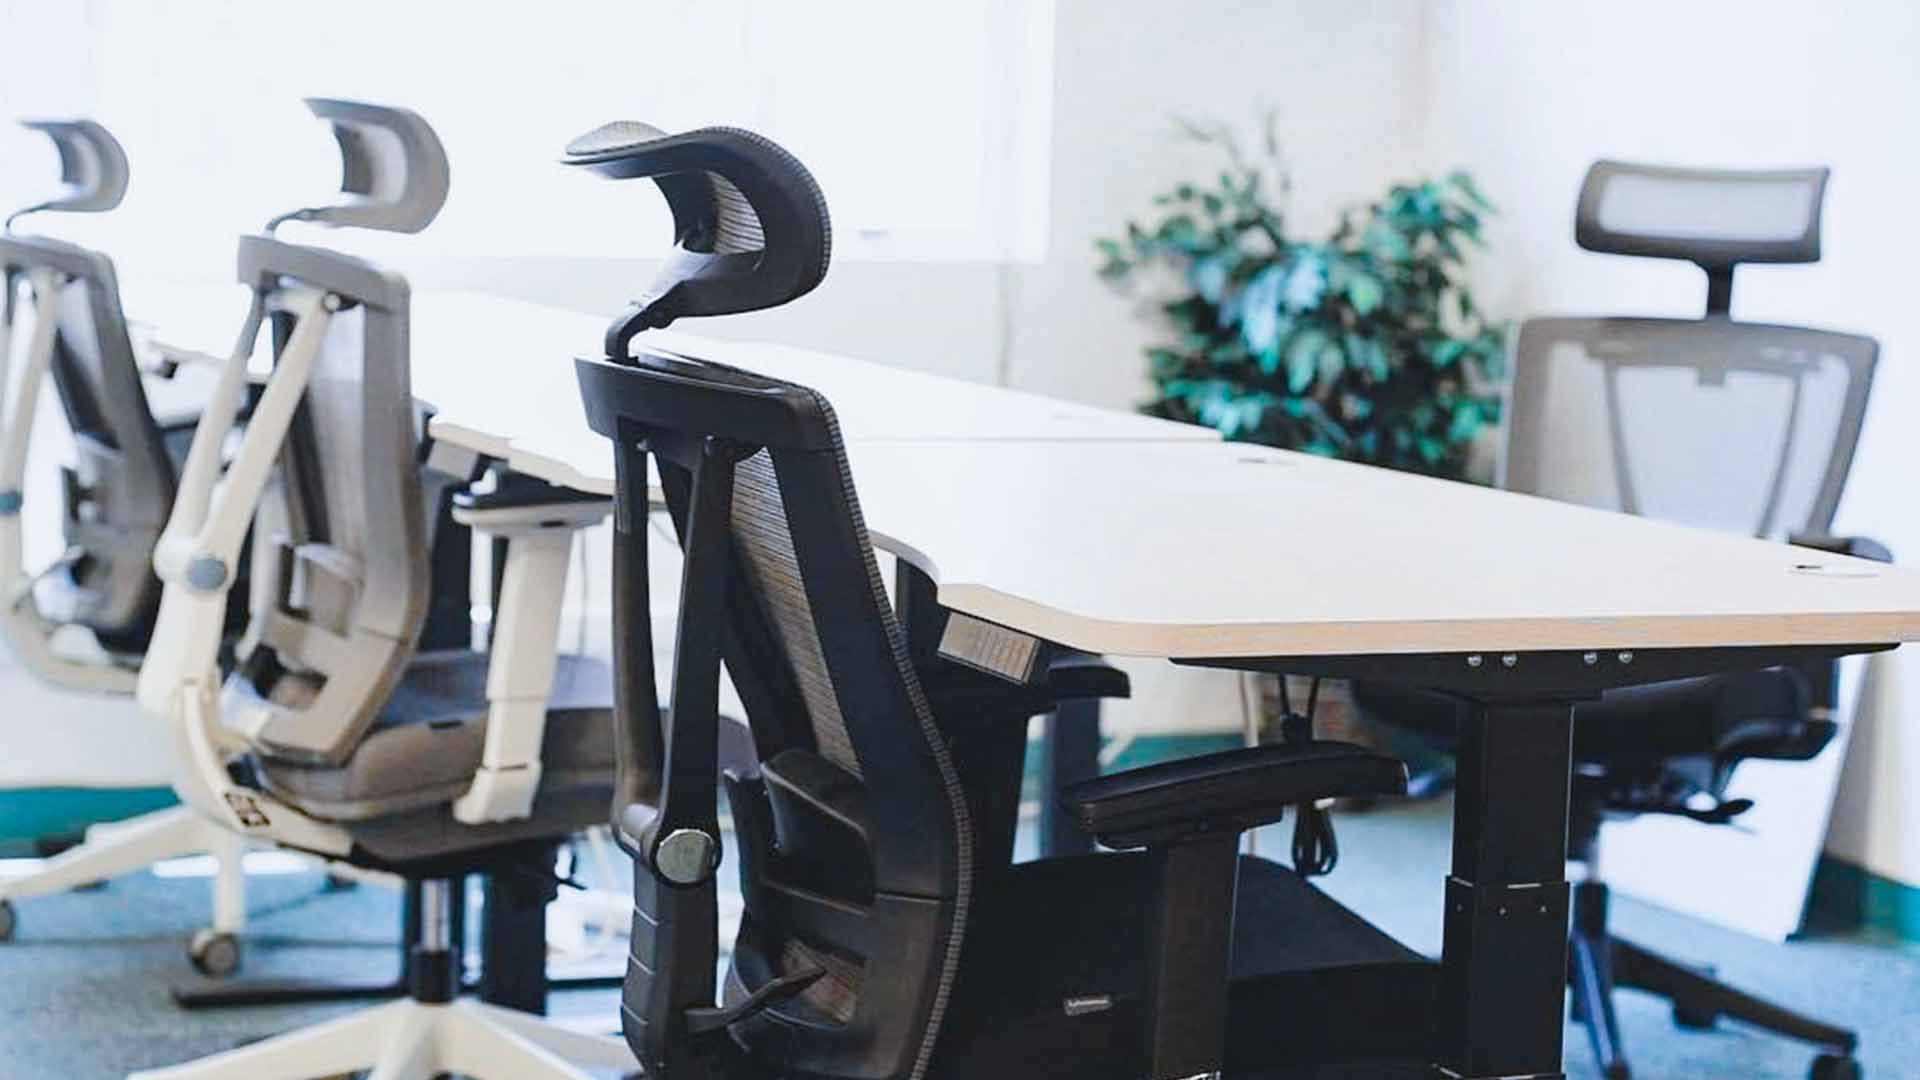 Phenomenal Top 12 Best Drafting Chairs For Standing Desk In 2018 Inzonedesignstudio Interior Chair Design Inzonedesignstudiocom